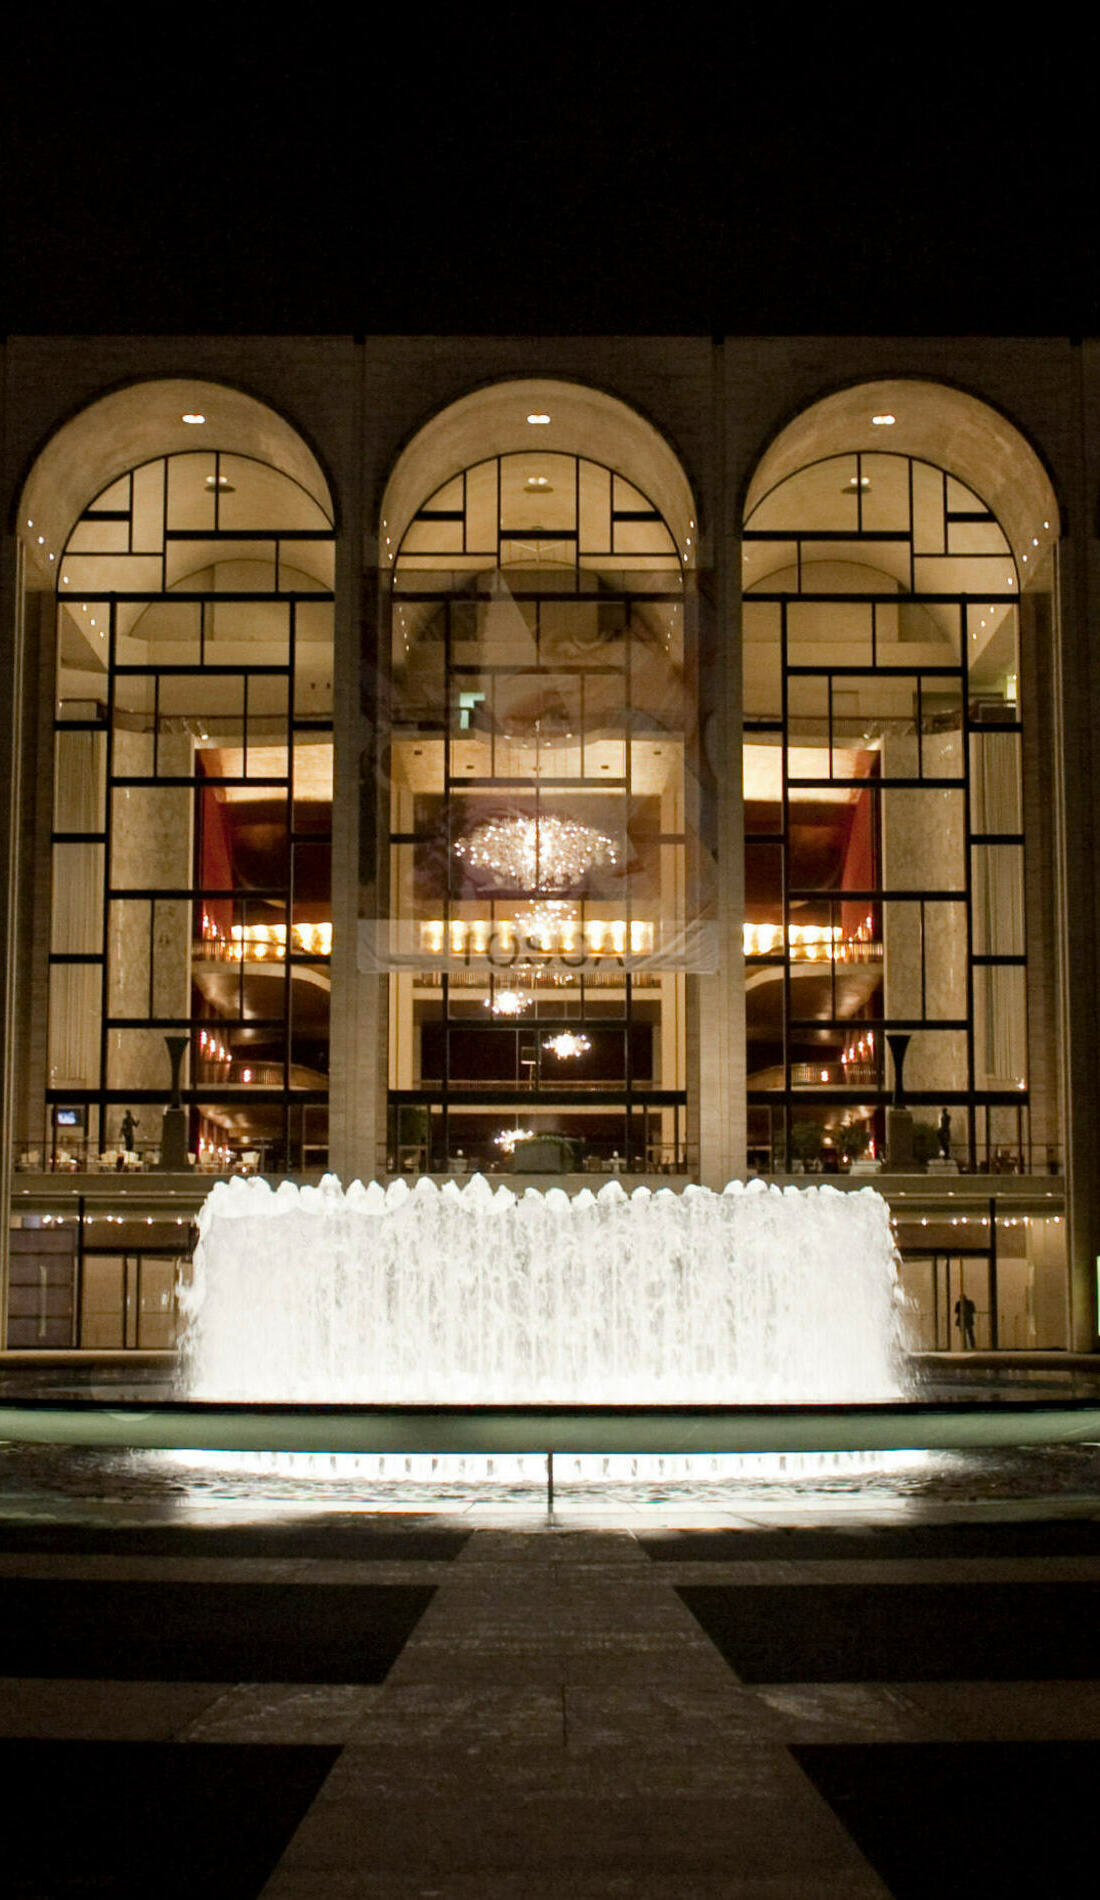 A Metropolitan Opera live event